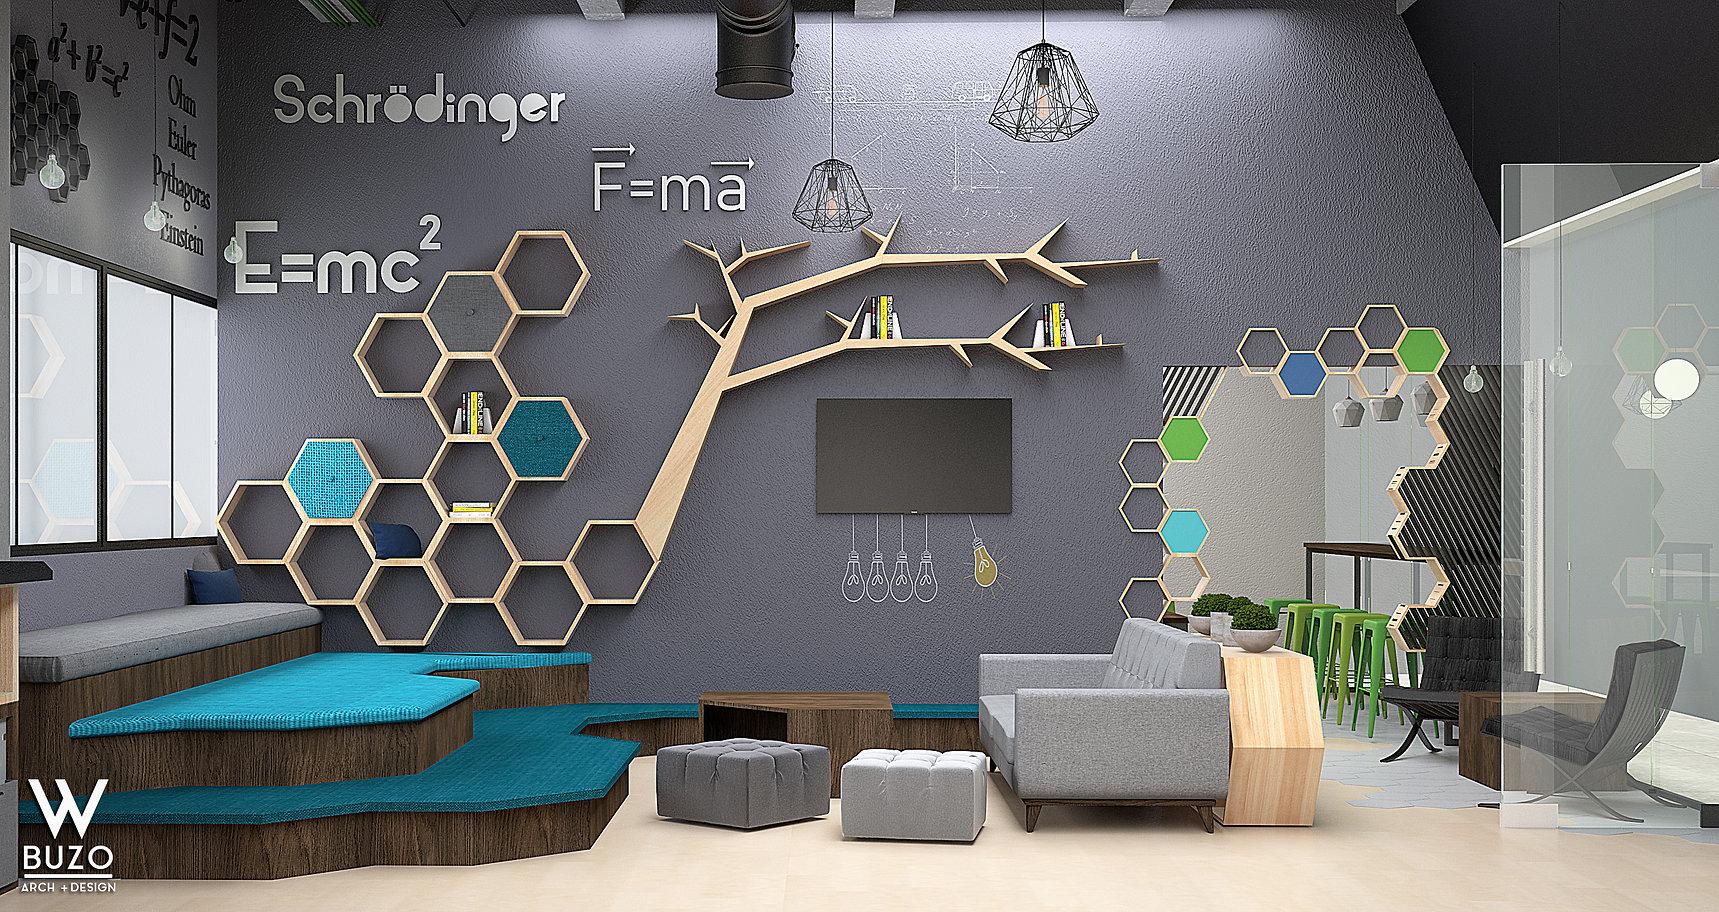 RENDER 3_Centro de negocios_300518.jpg